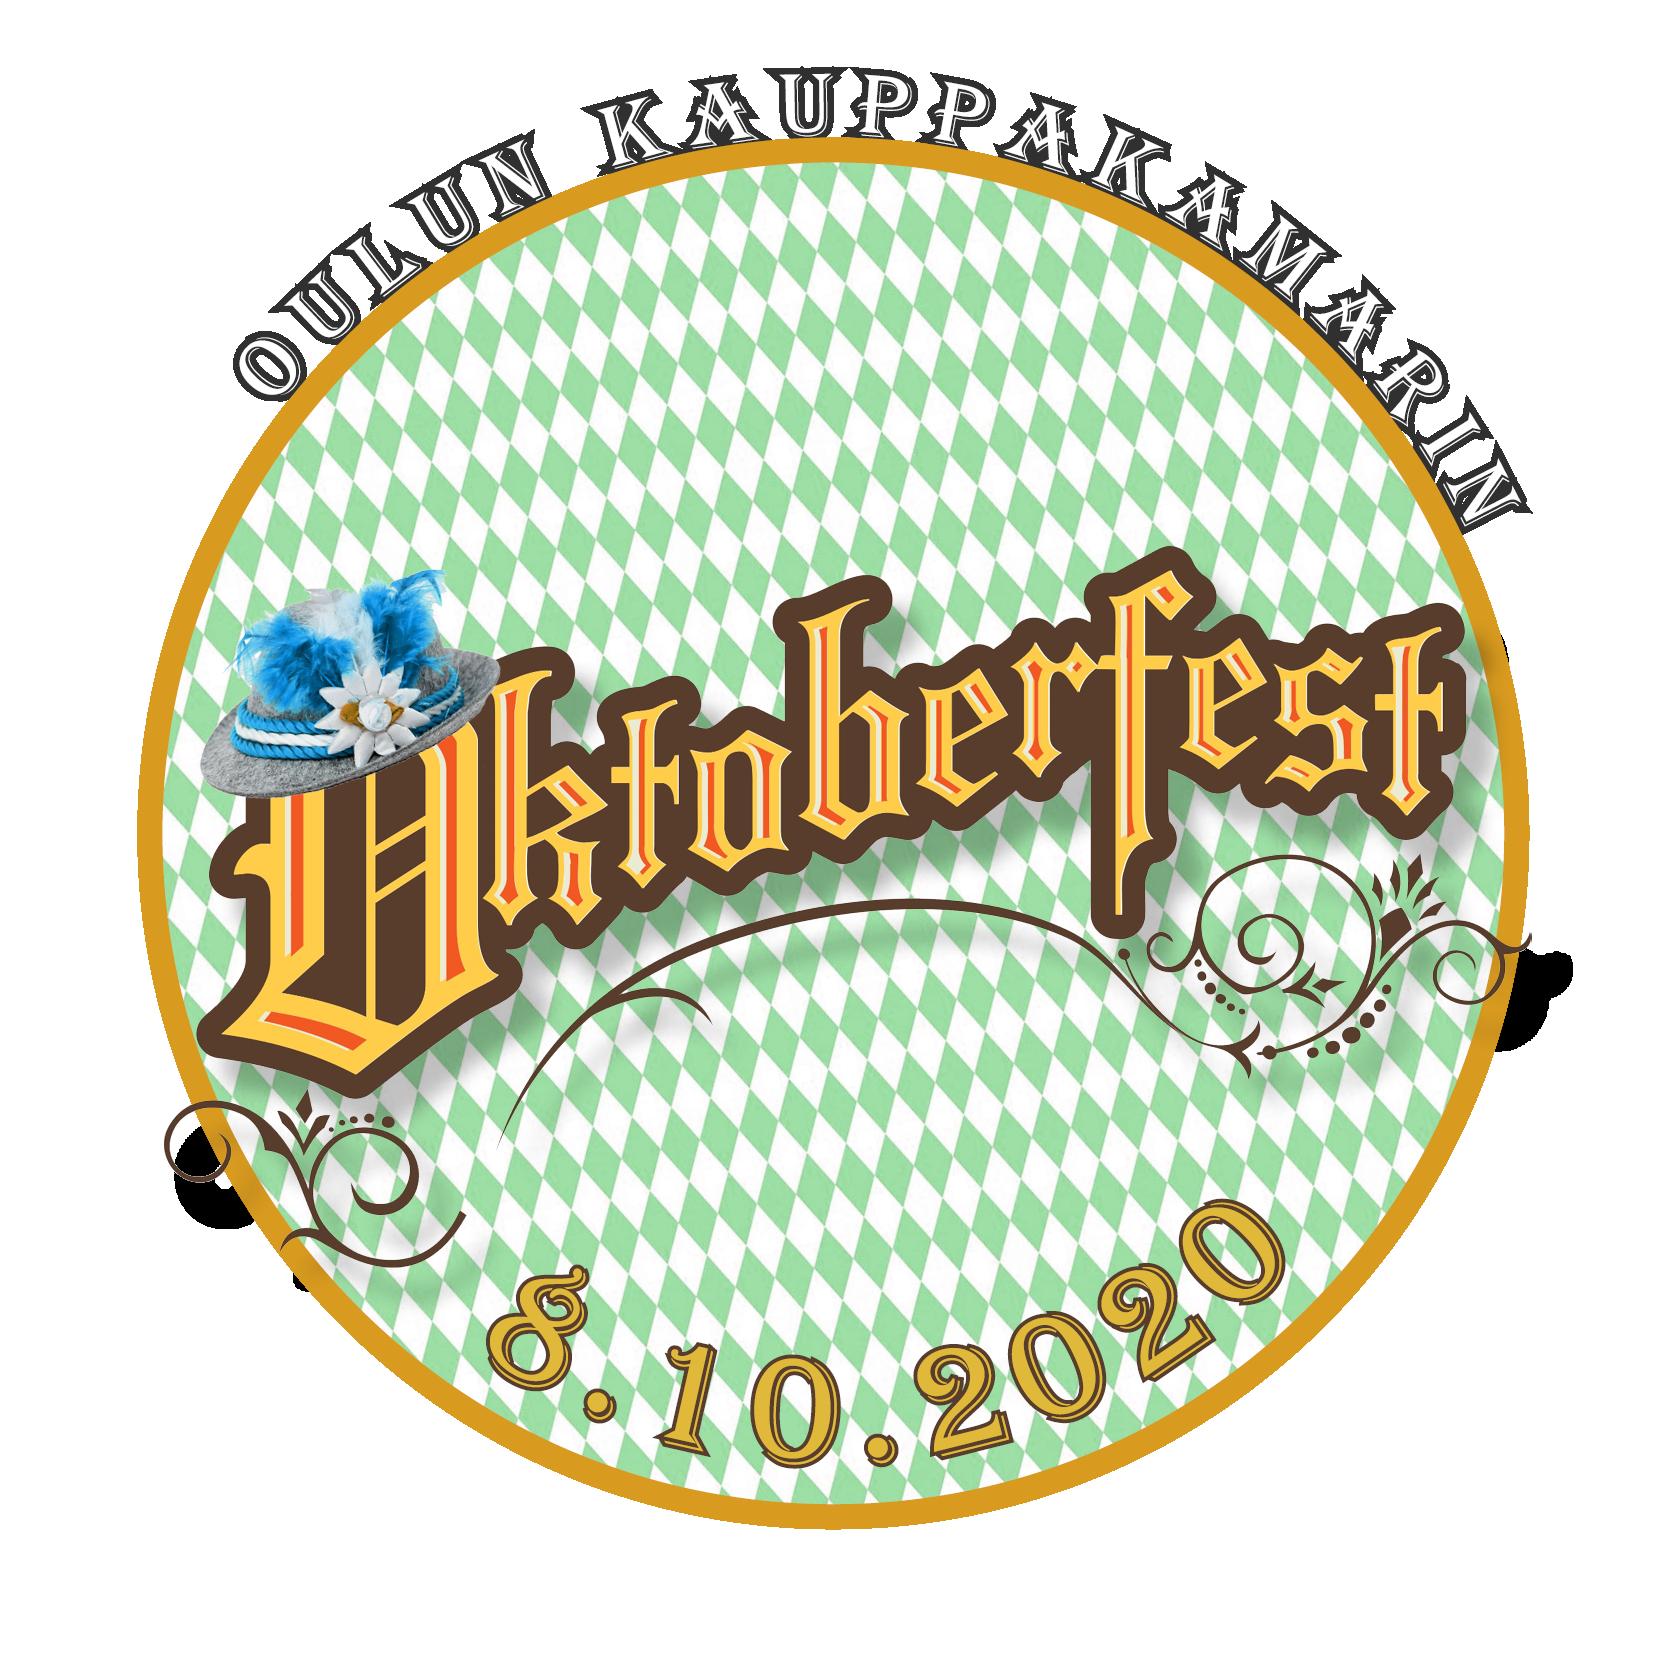 oktoberfest-2020-_logo.png (2.18 MB)